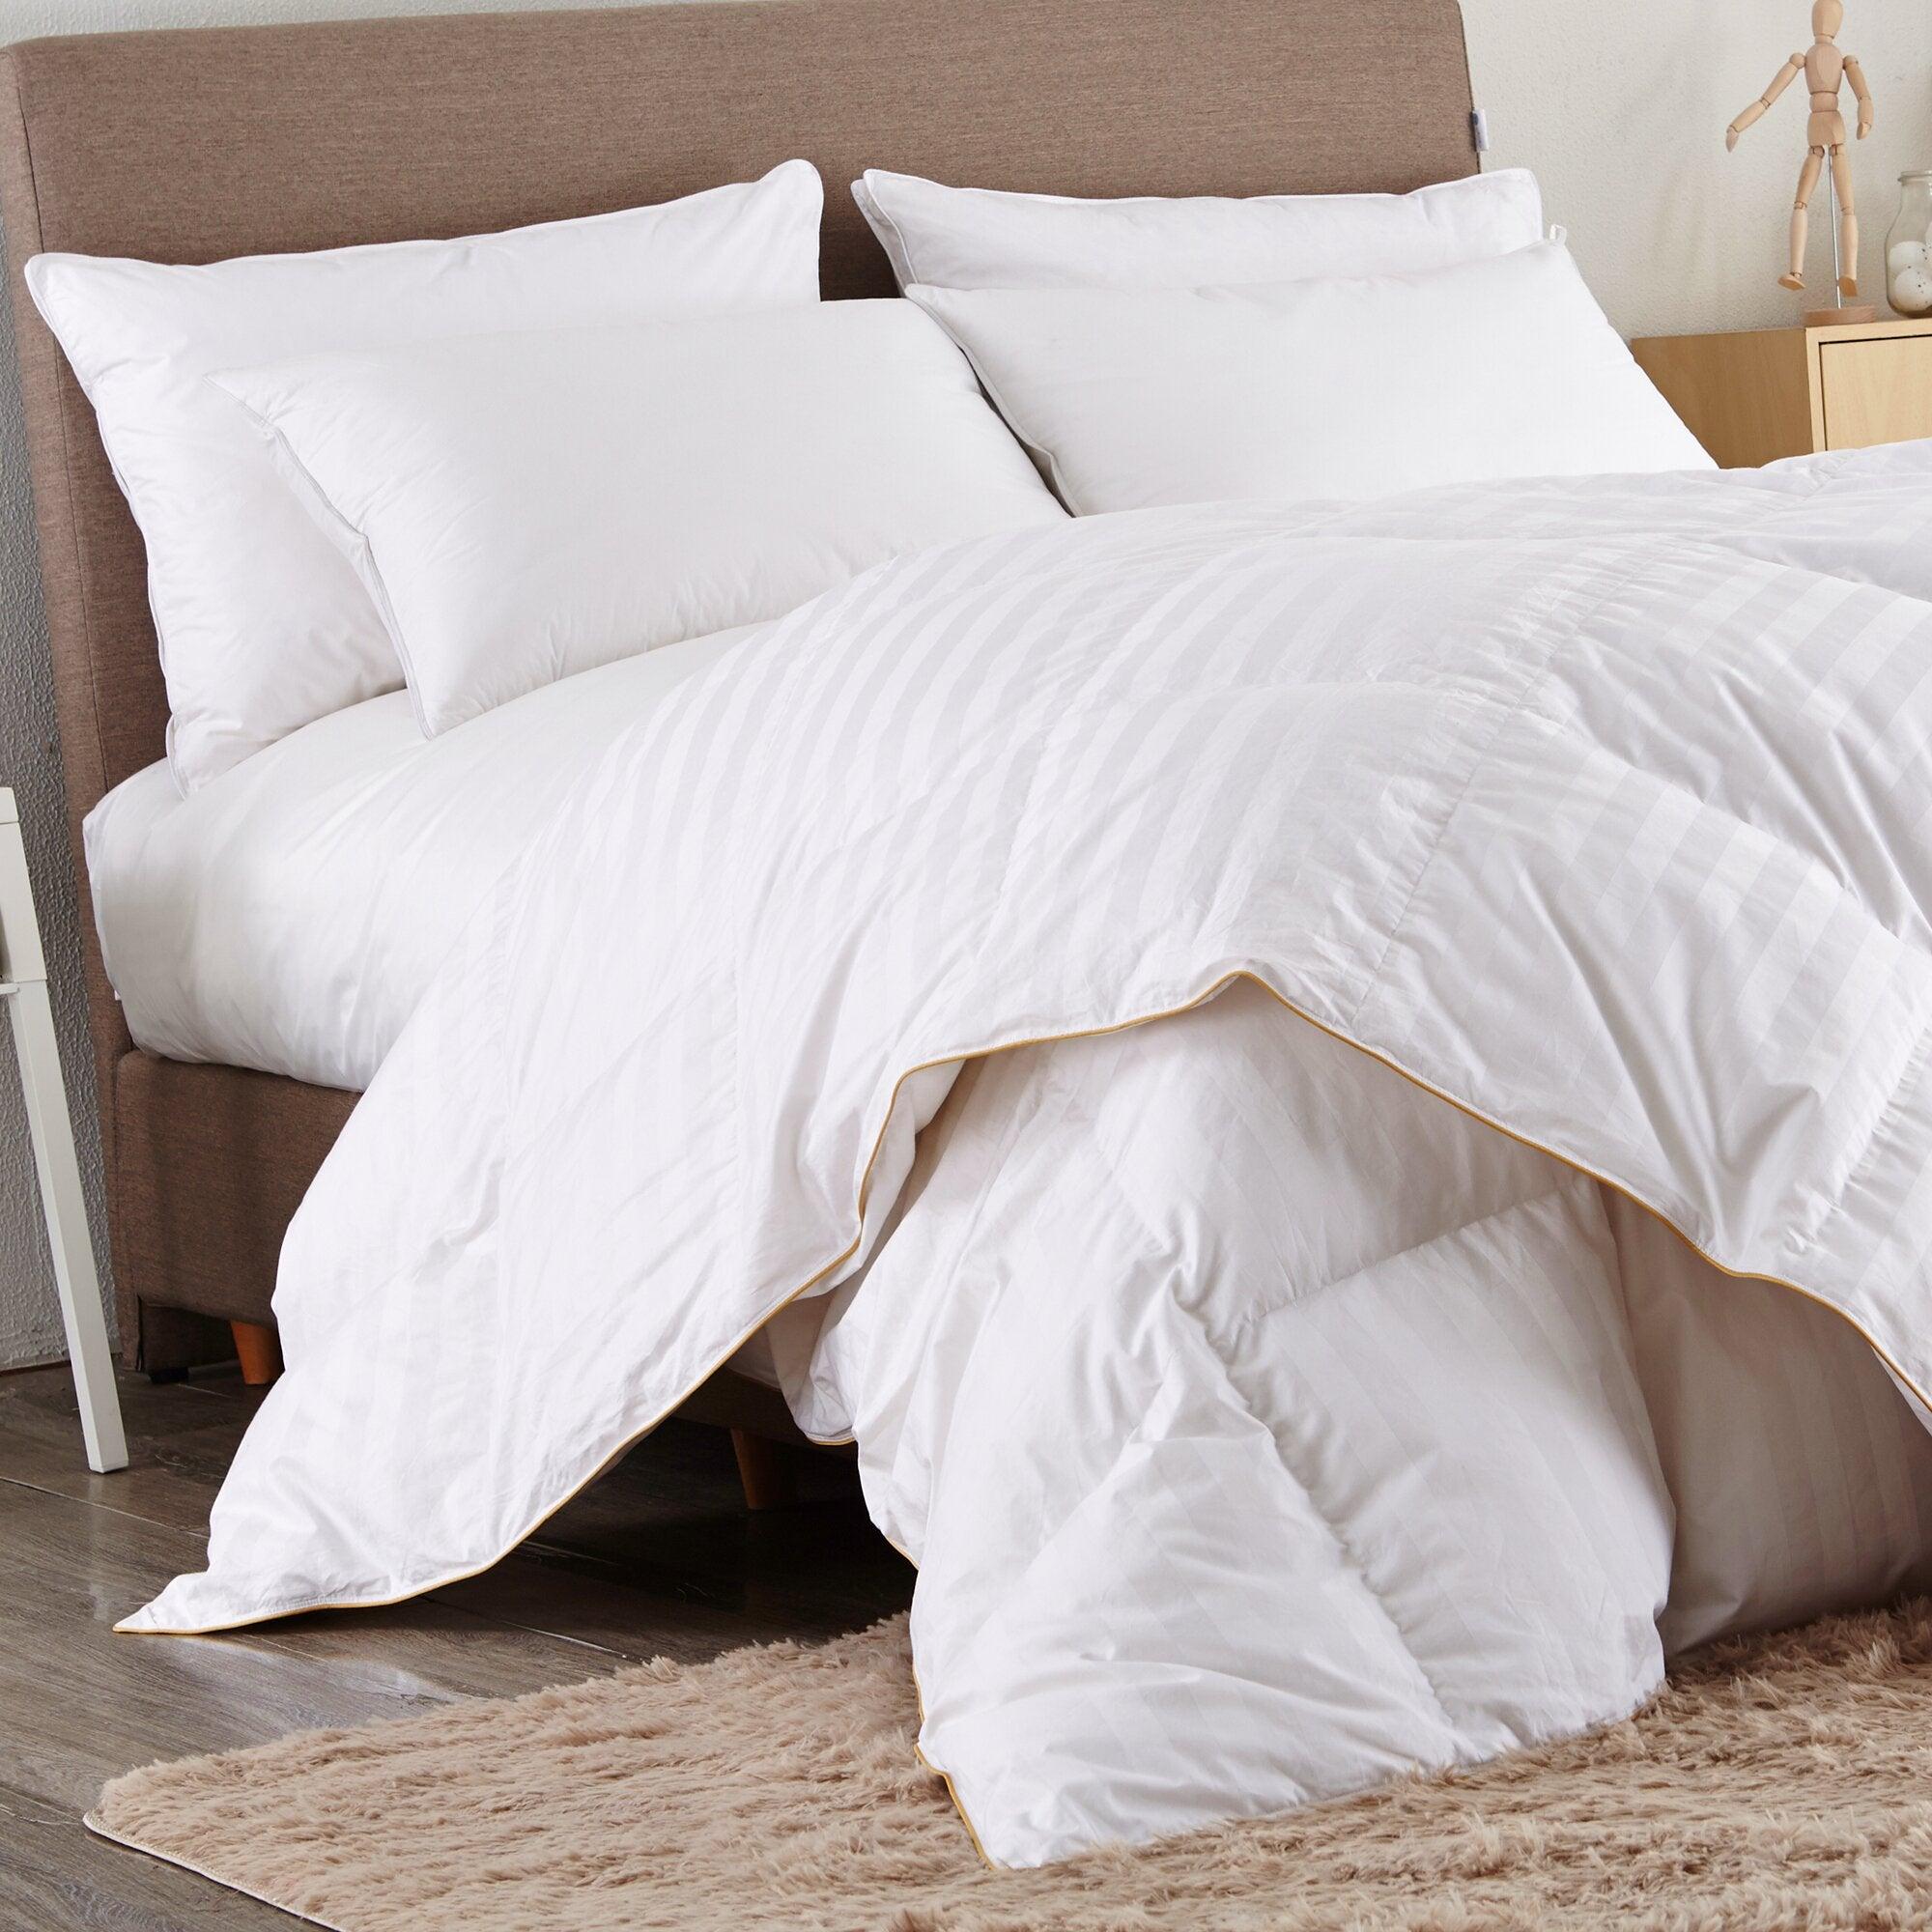 500 all season goose down comforter